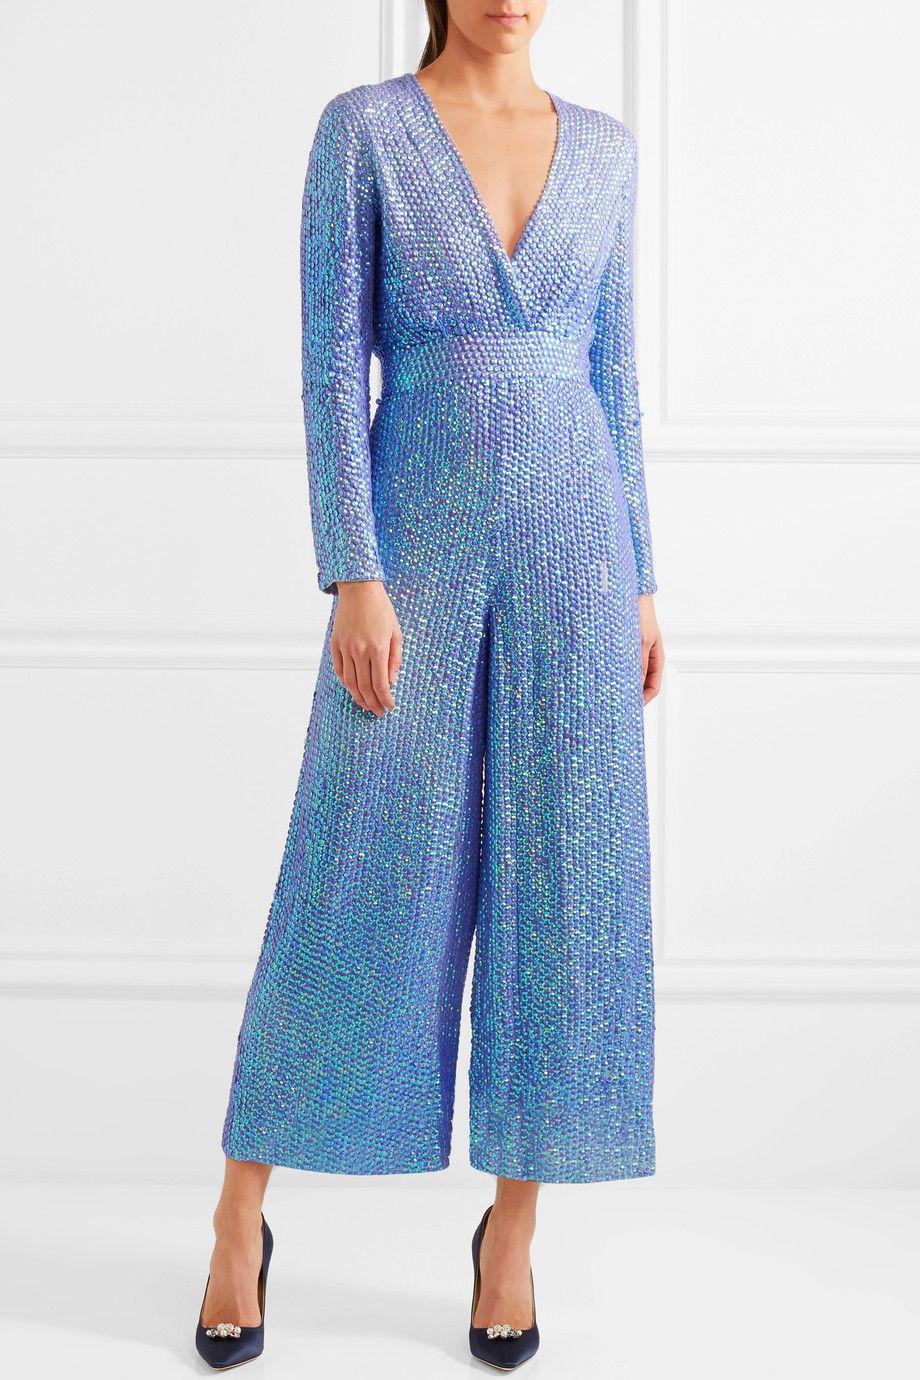 Temperley London | Tiara sequined chiffon jumpsuit | NET-A-PORTER ...